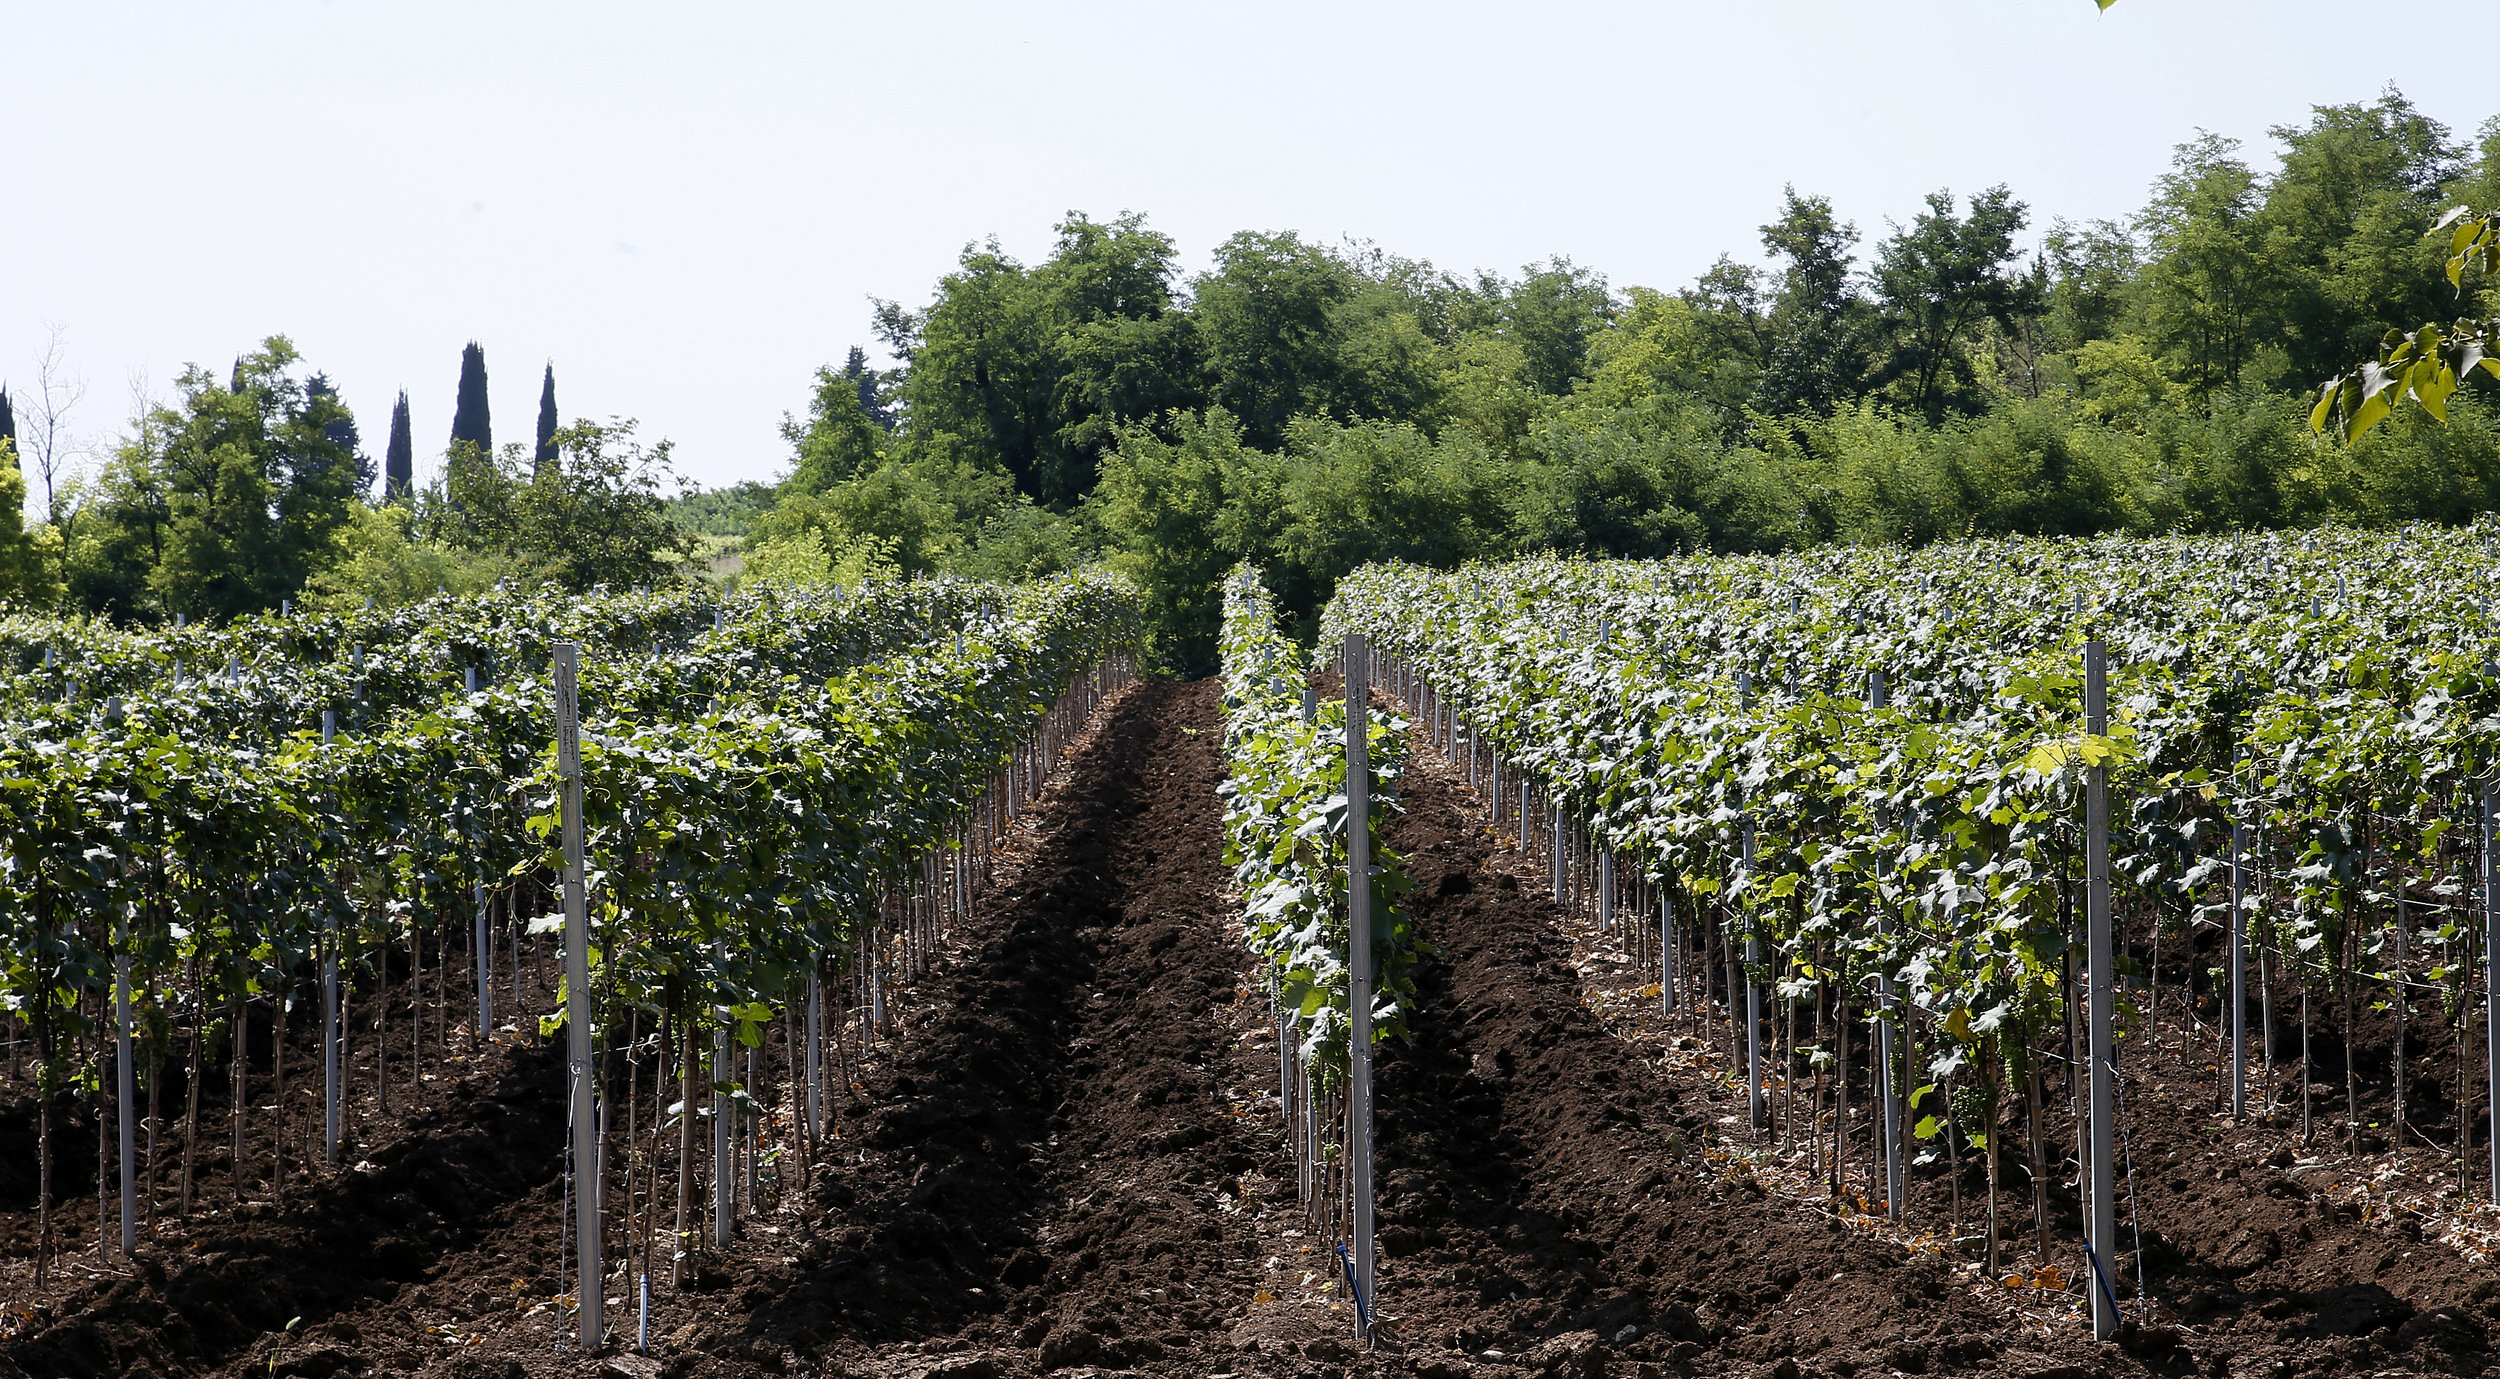 Many grape vines producing grapes such as Khikhvi, Mtsvane and Saperavi